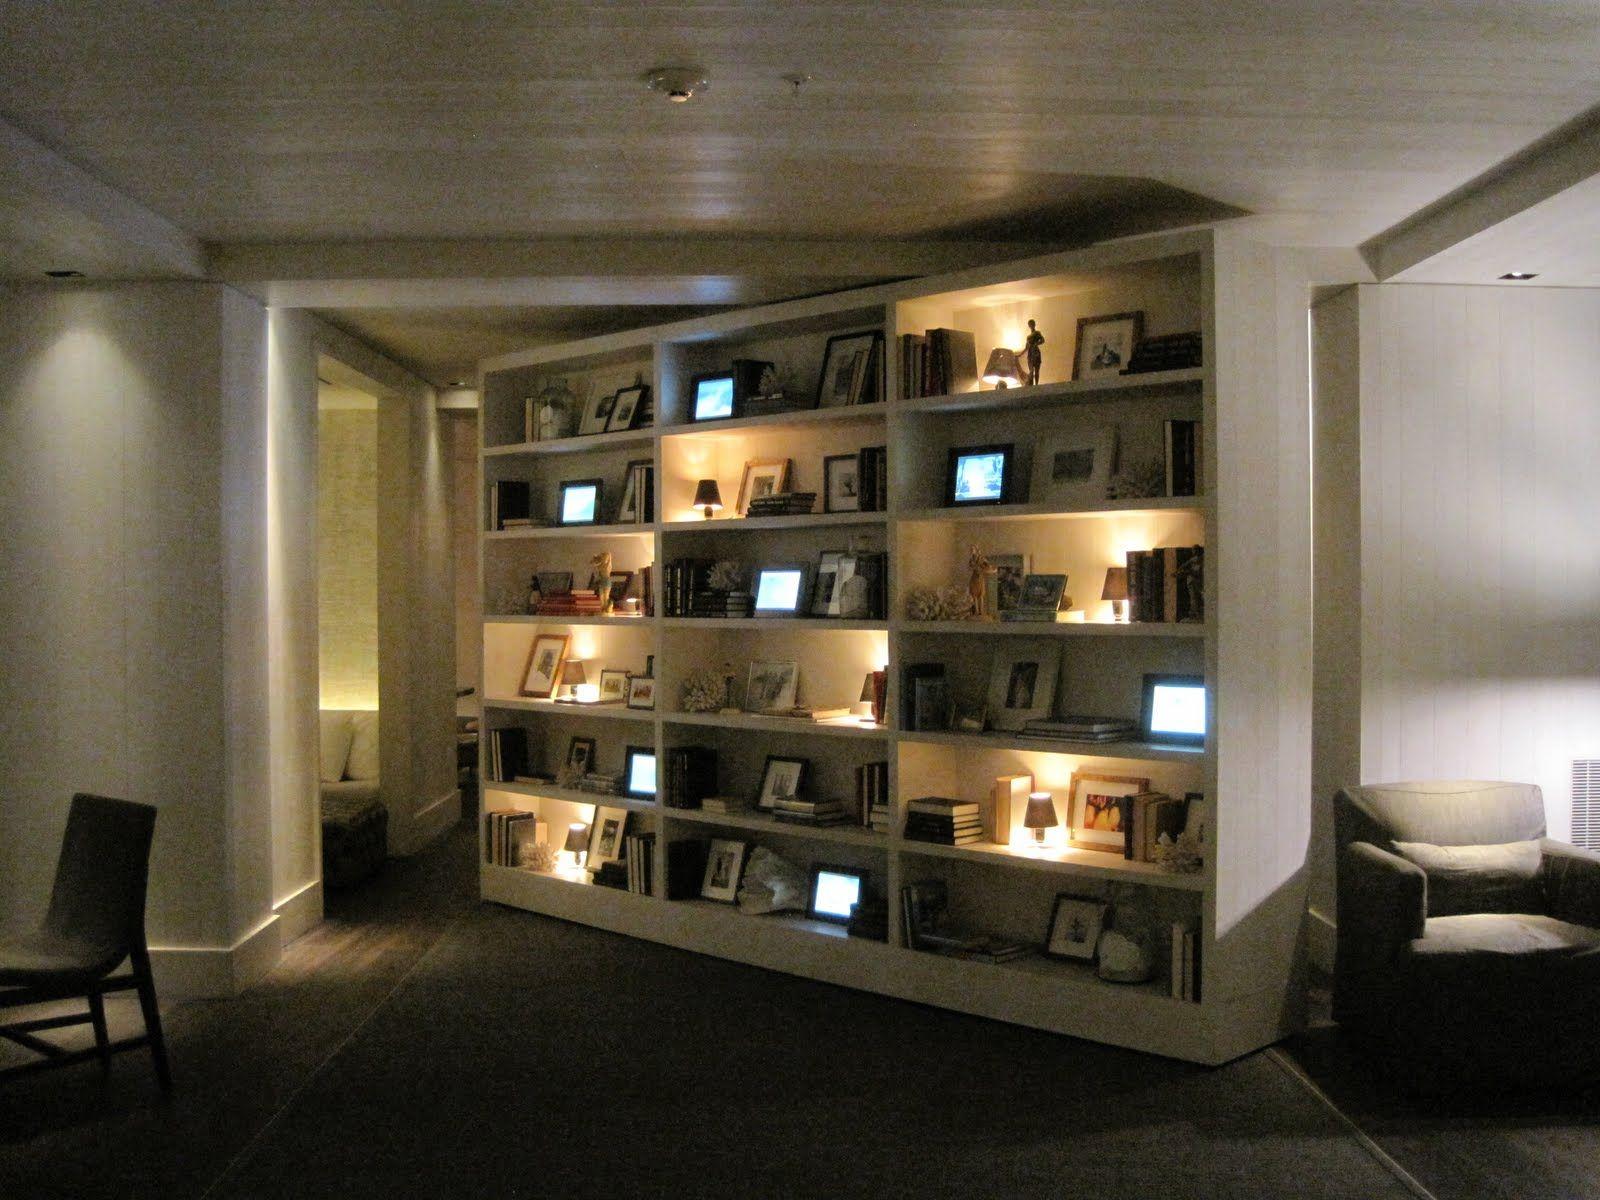 hidden mesmerizing secret large sale the closet for shelf bookcases bookcase book do bookshelf build size door doors of